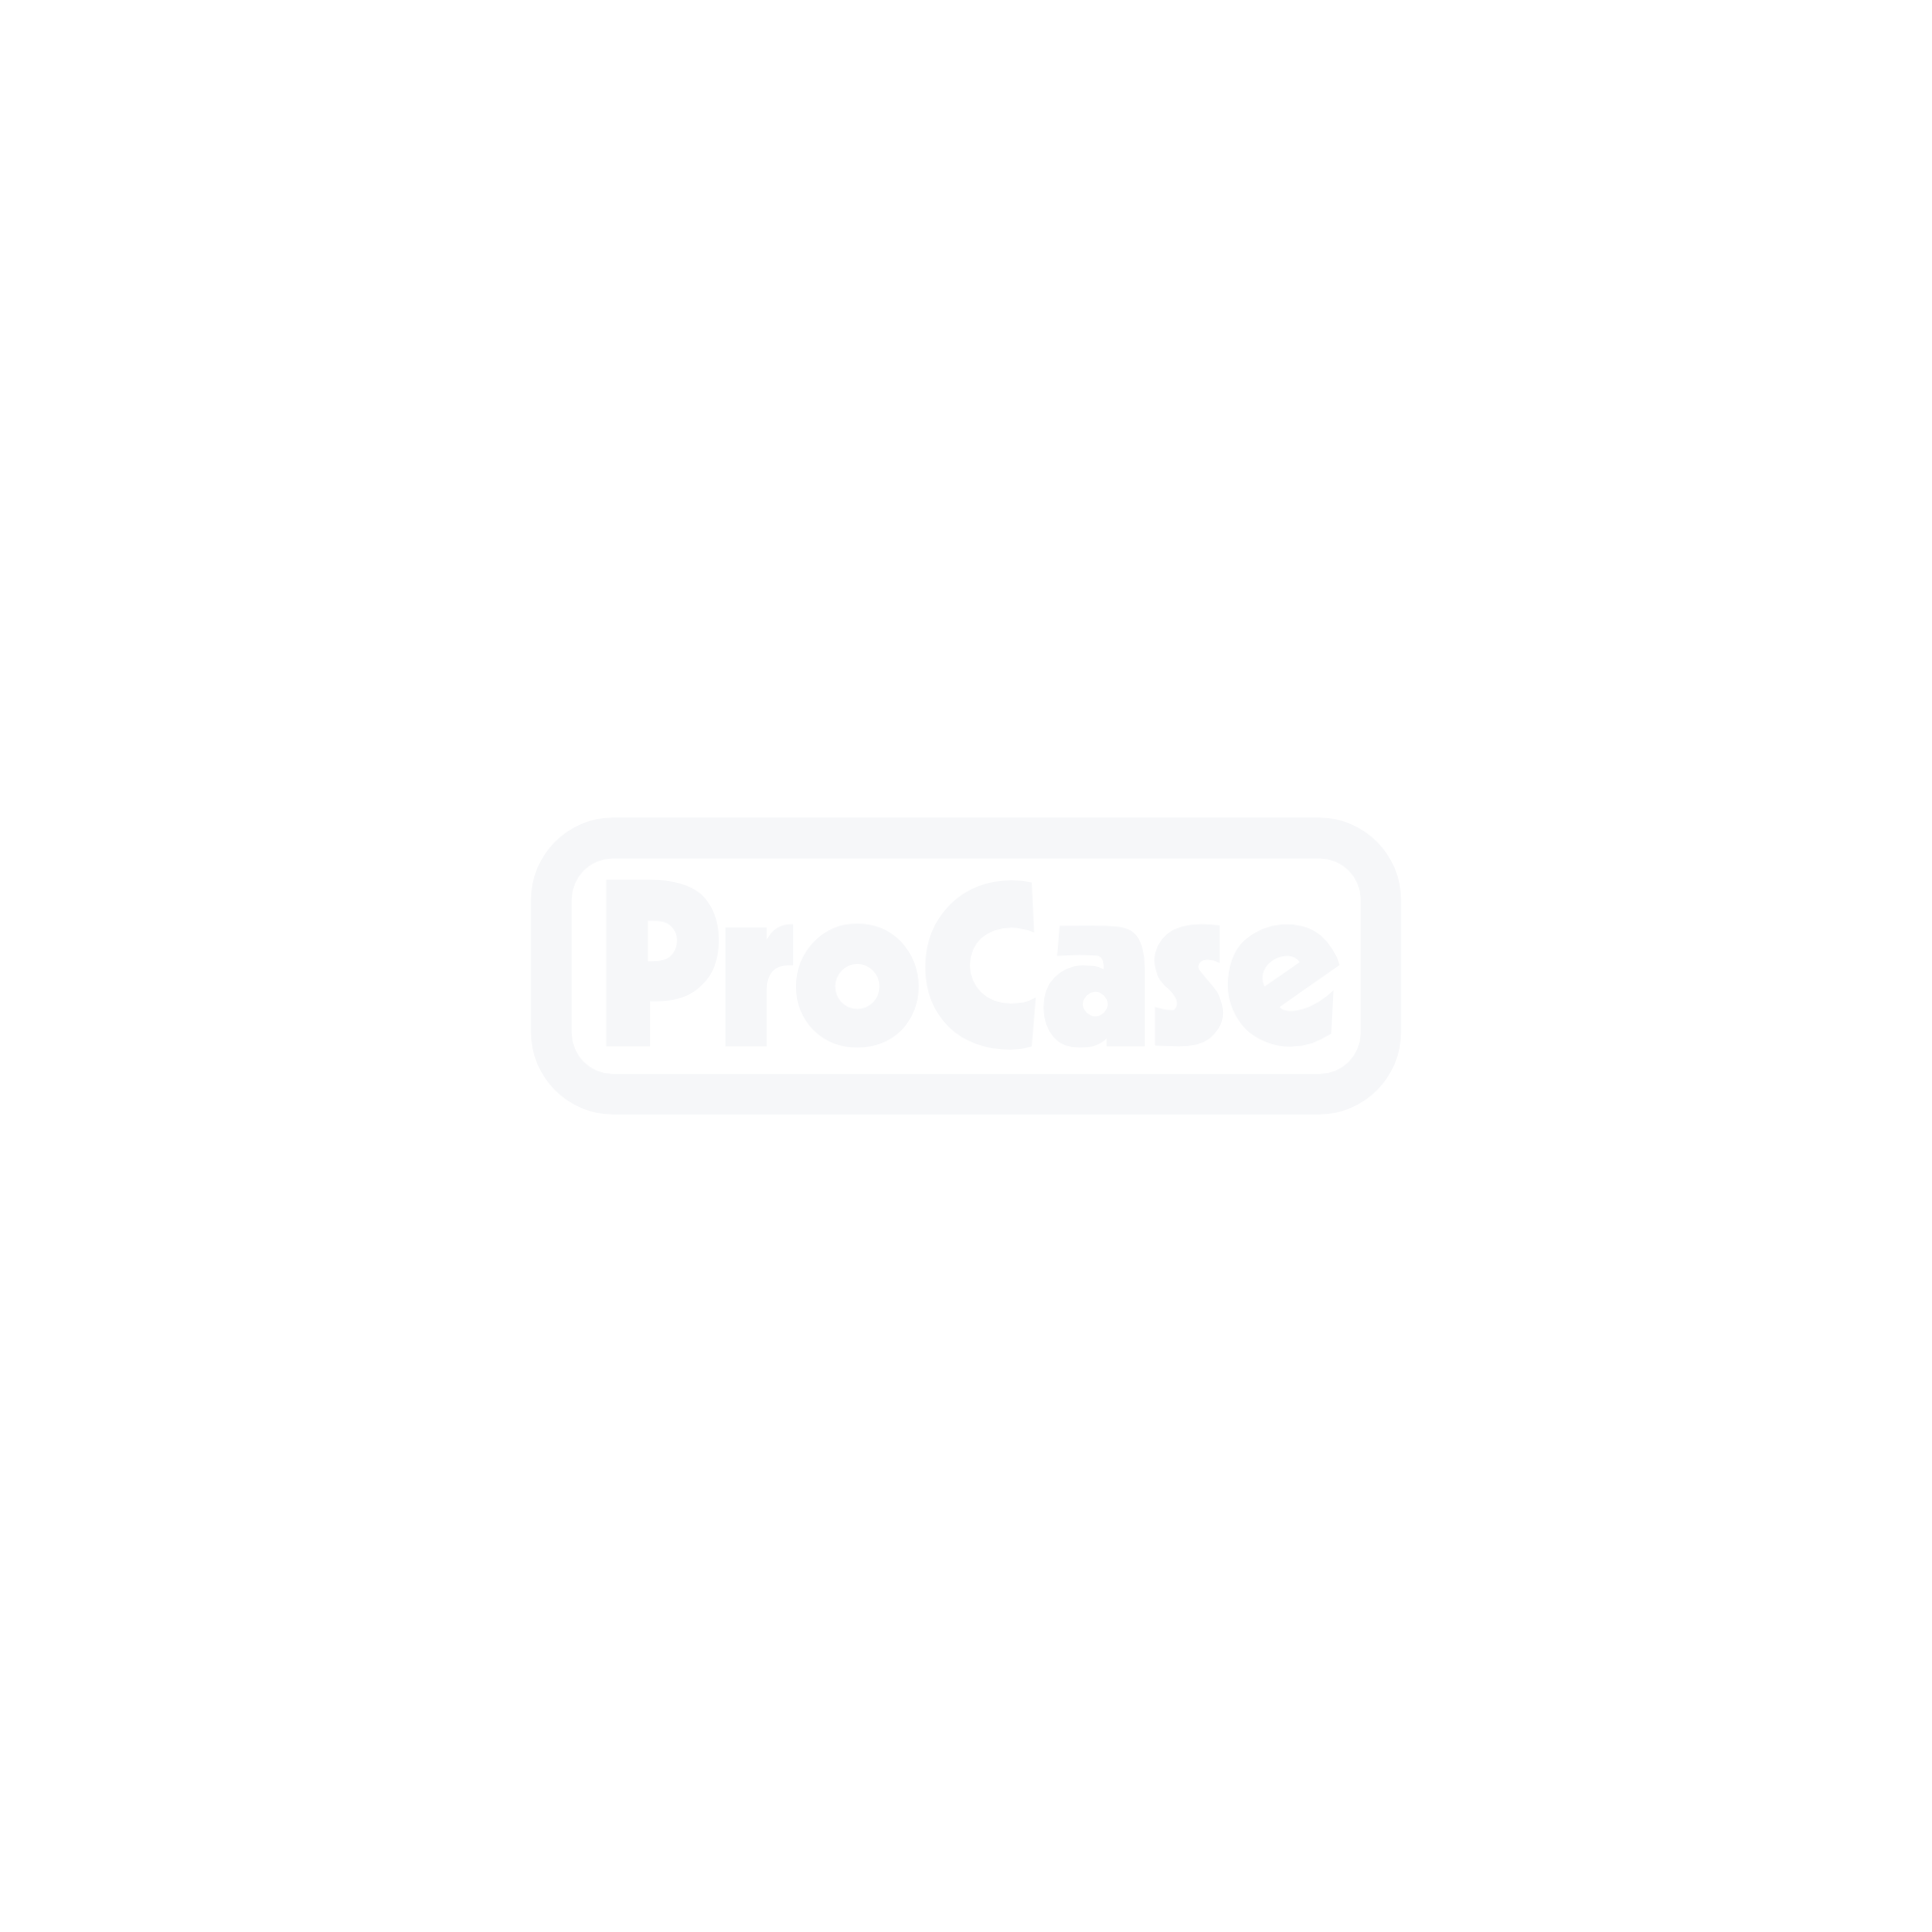 Flightcase für 2 AKG GN 155 Mikrofonsysteme